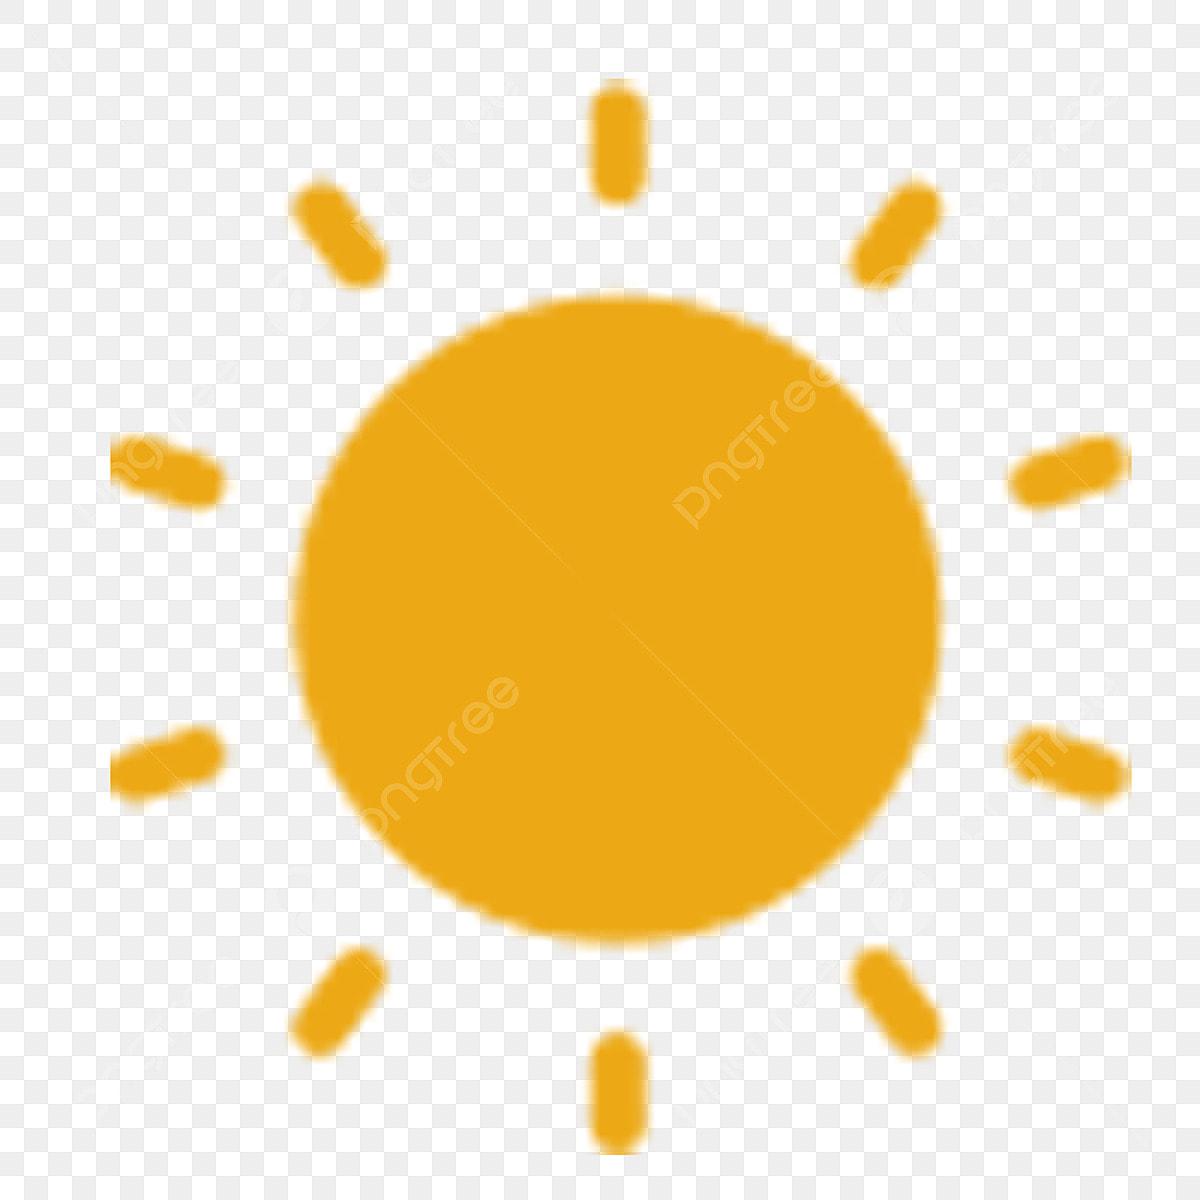 Cahaya Matahari Sinar Matahari Kartun Kuning Cuaca Hujan